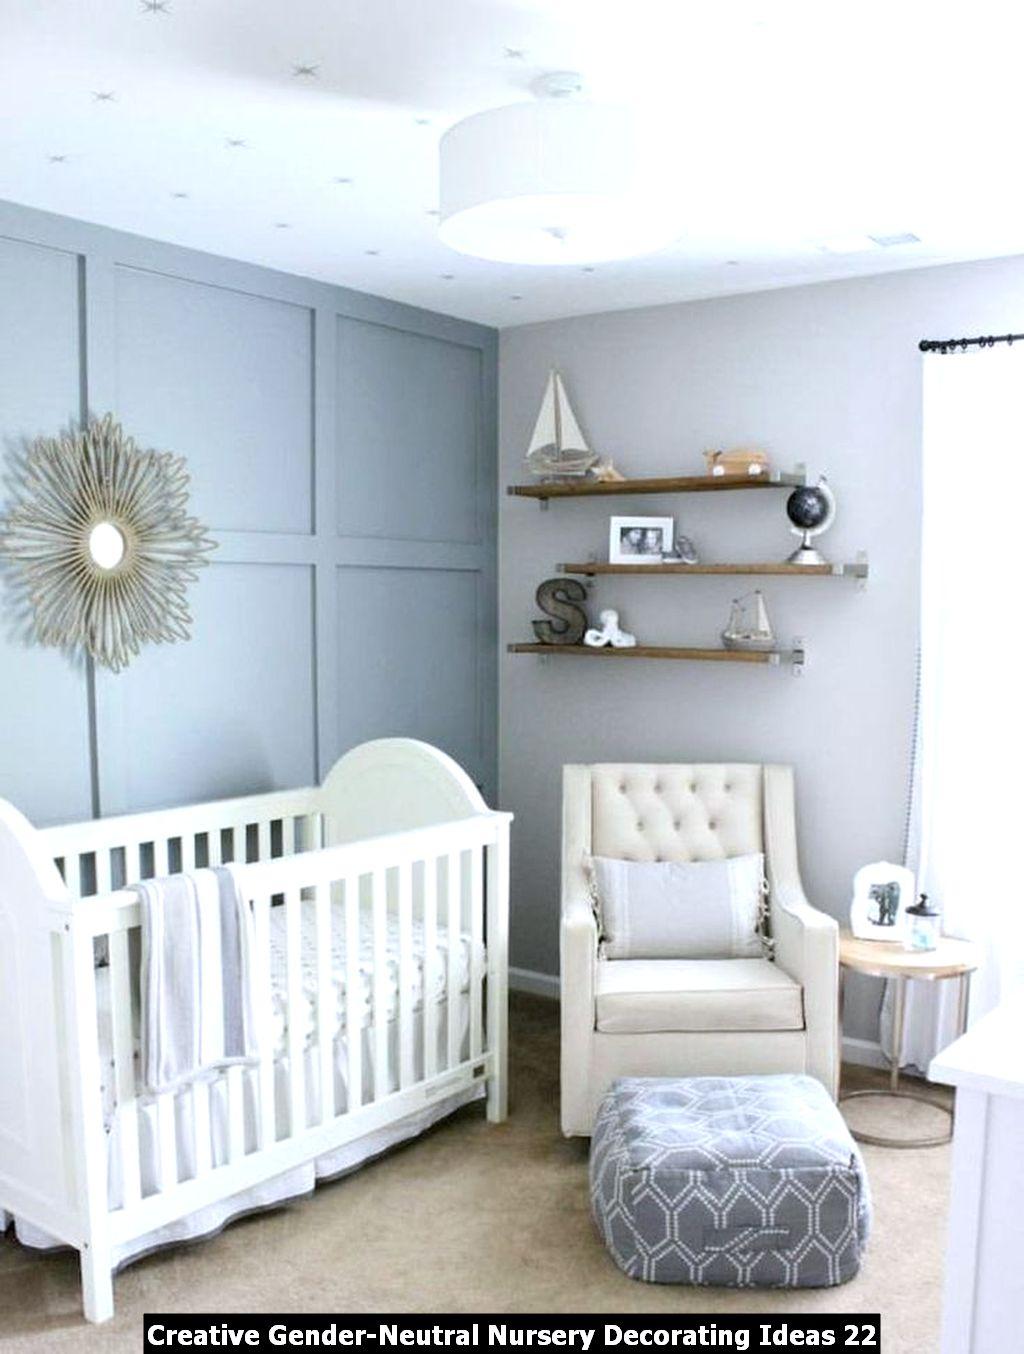 Creative Gender Neutral Nursery Decorating Ideas 22